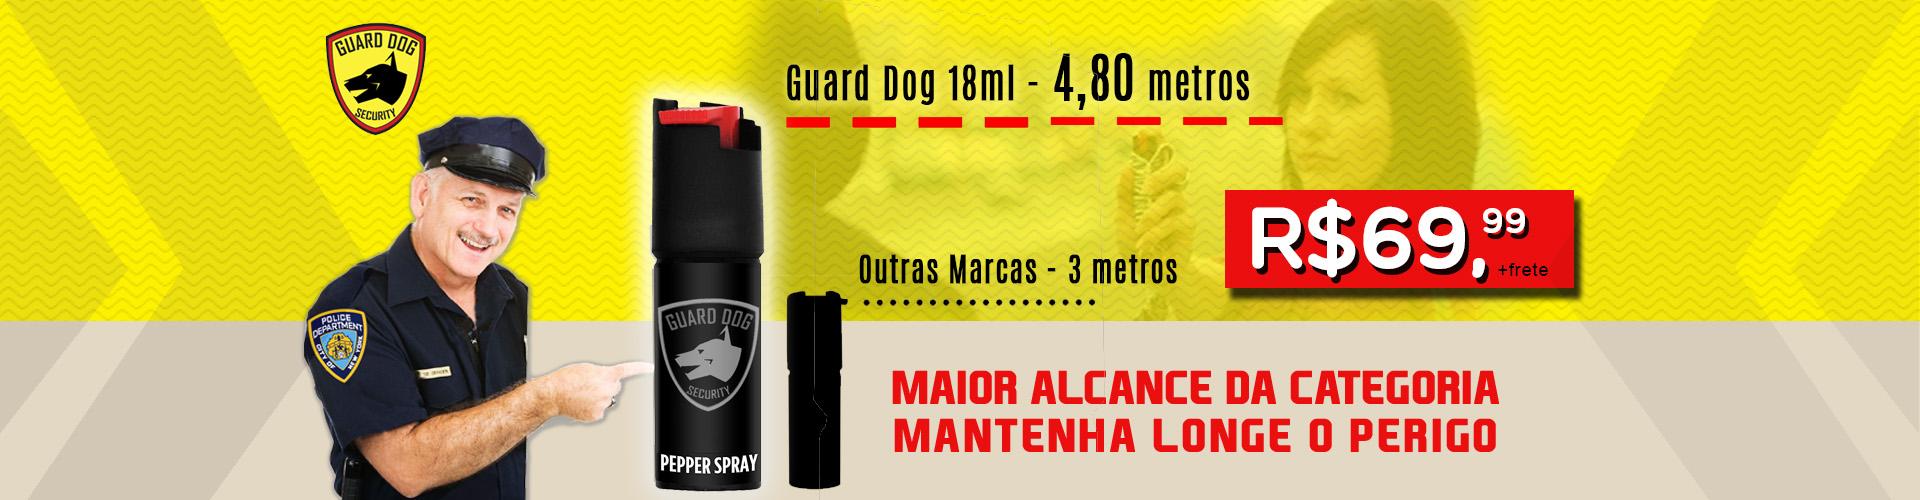 GUARD DOG SPRAY 18ML CINZA